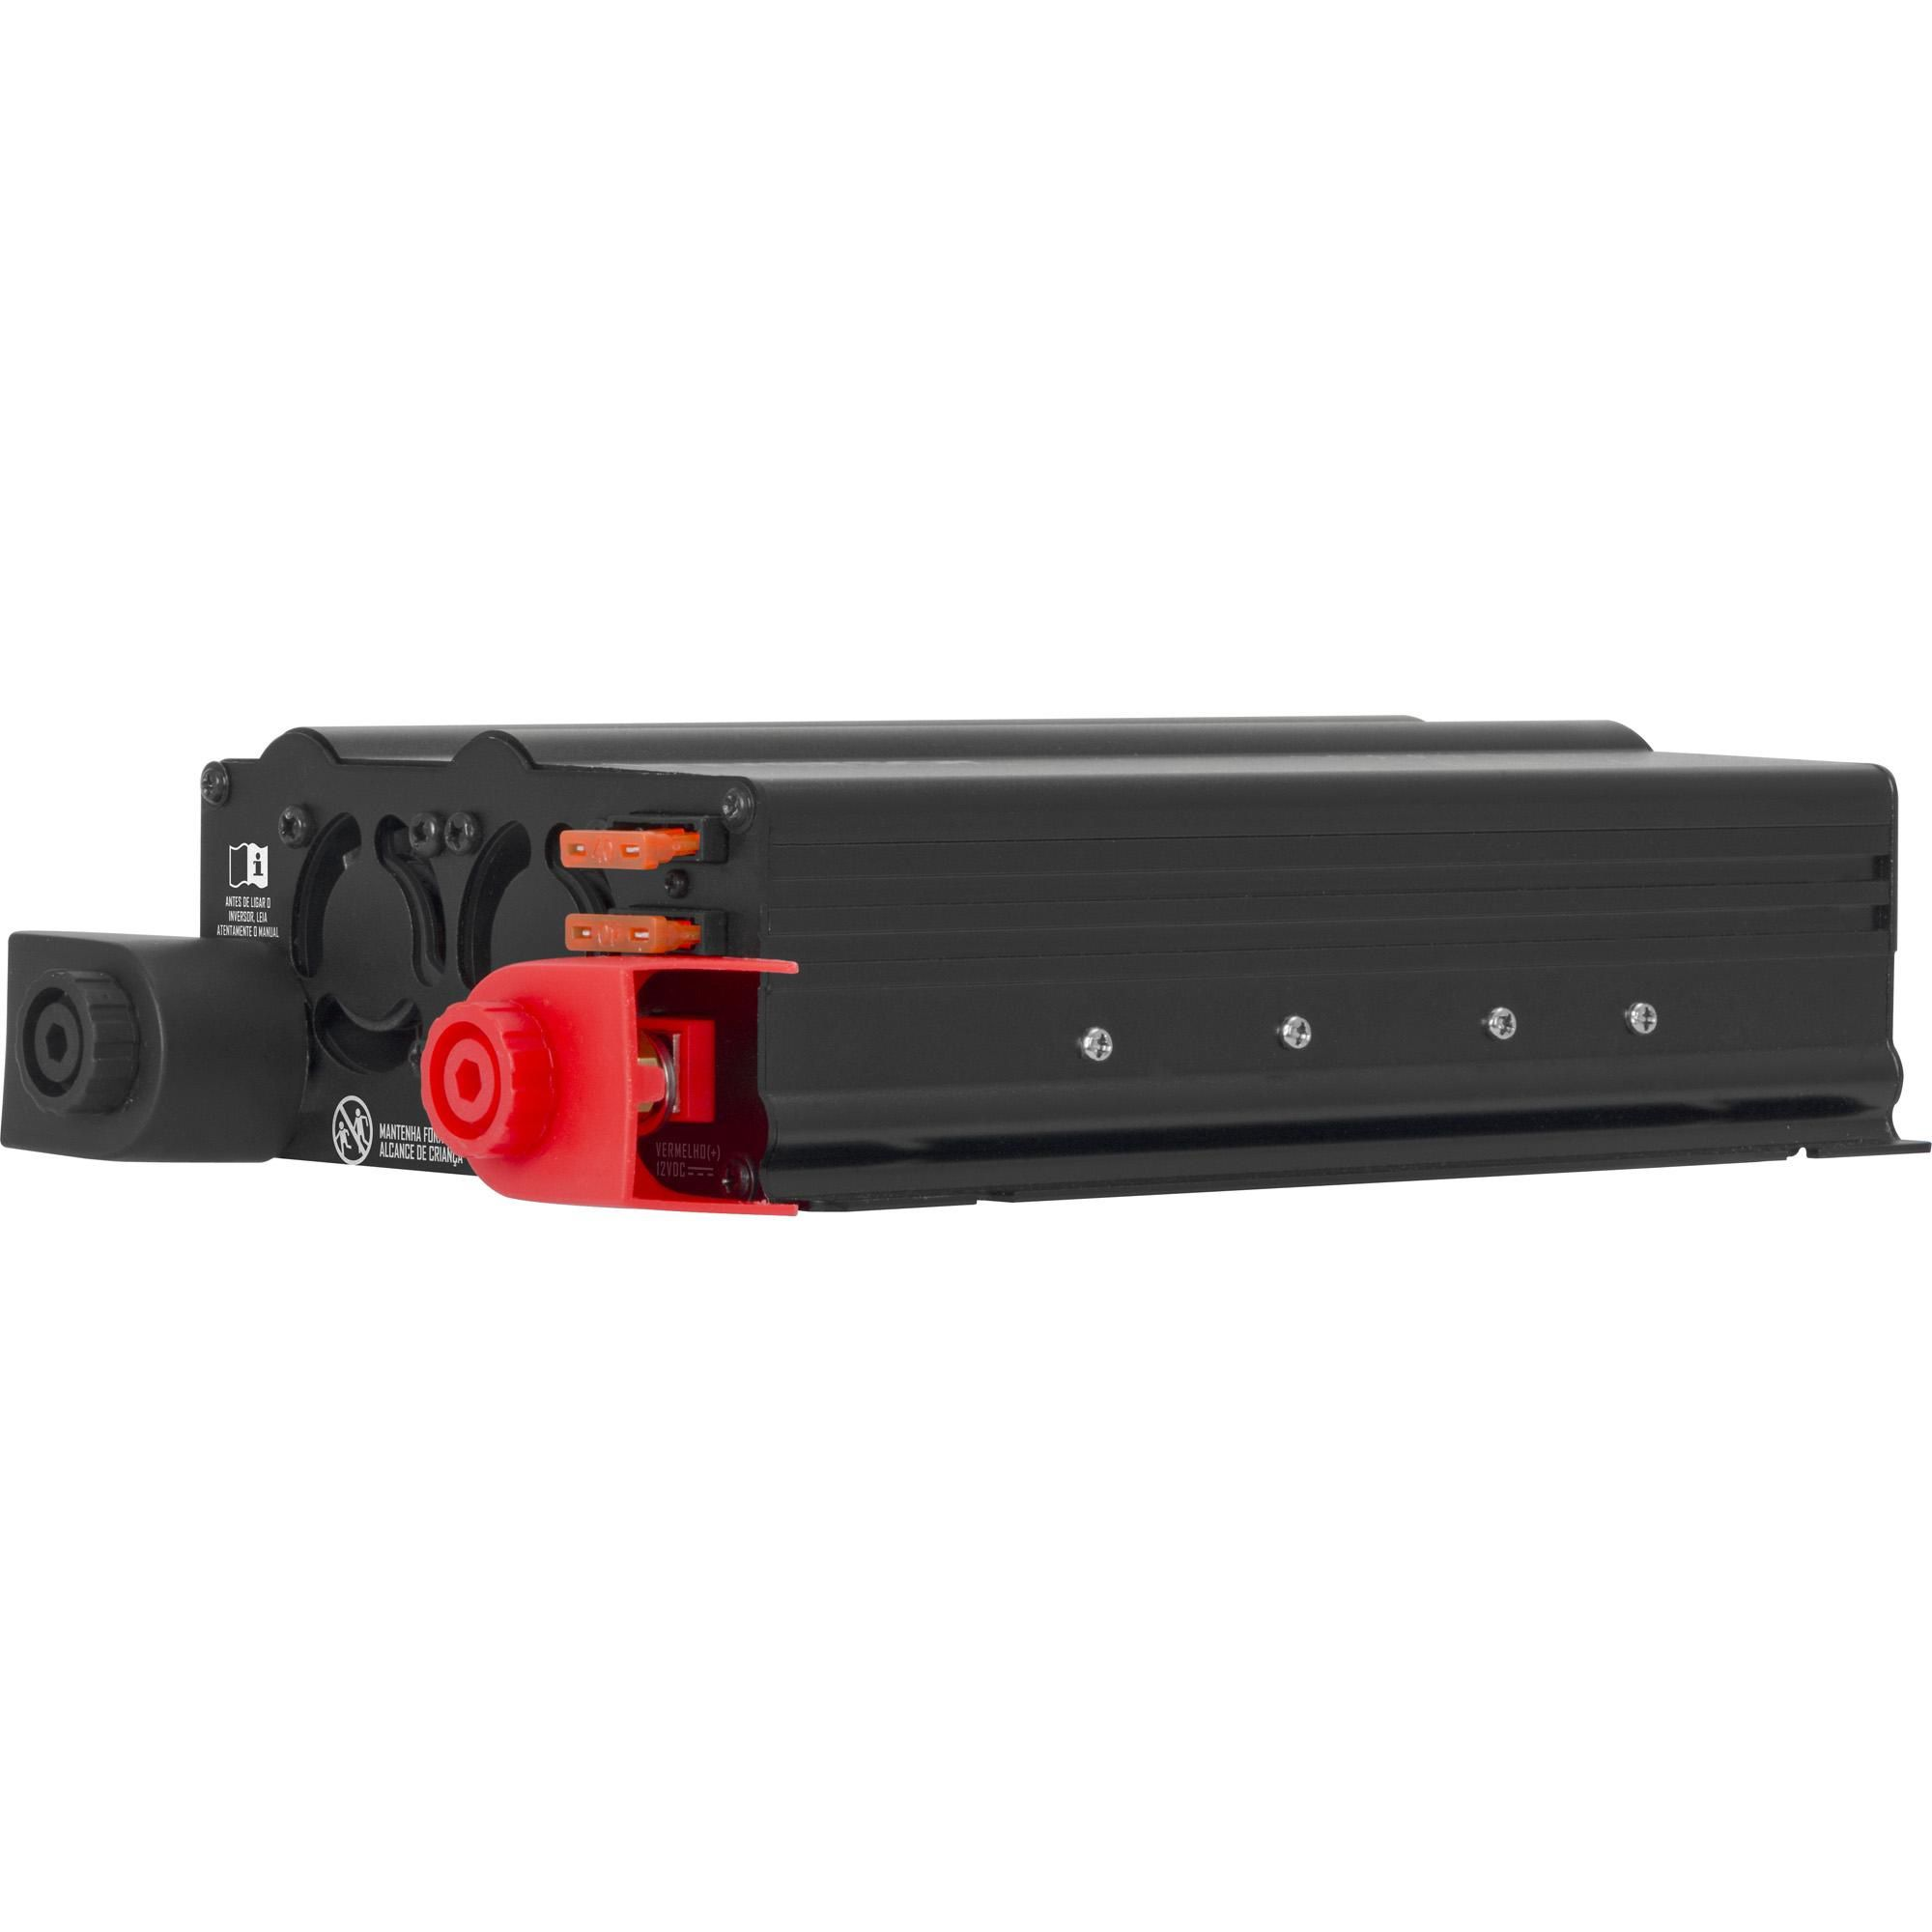 INVERSOR HAYONIK 1000W 12VDC/127V USB MODIFICADA- GD